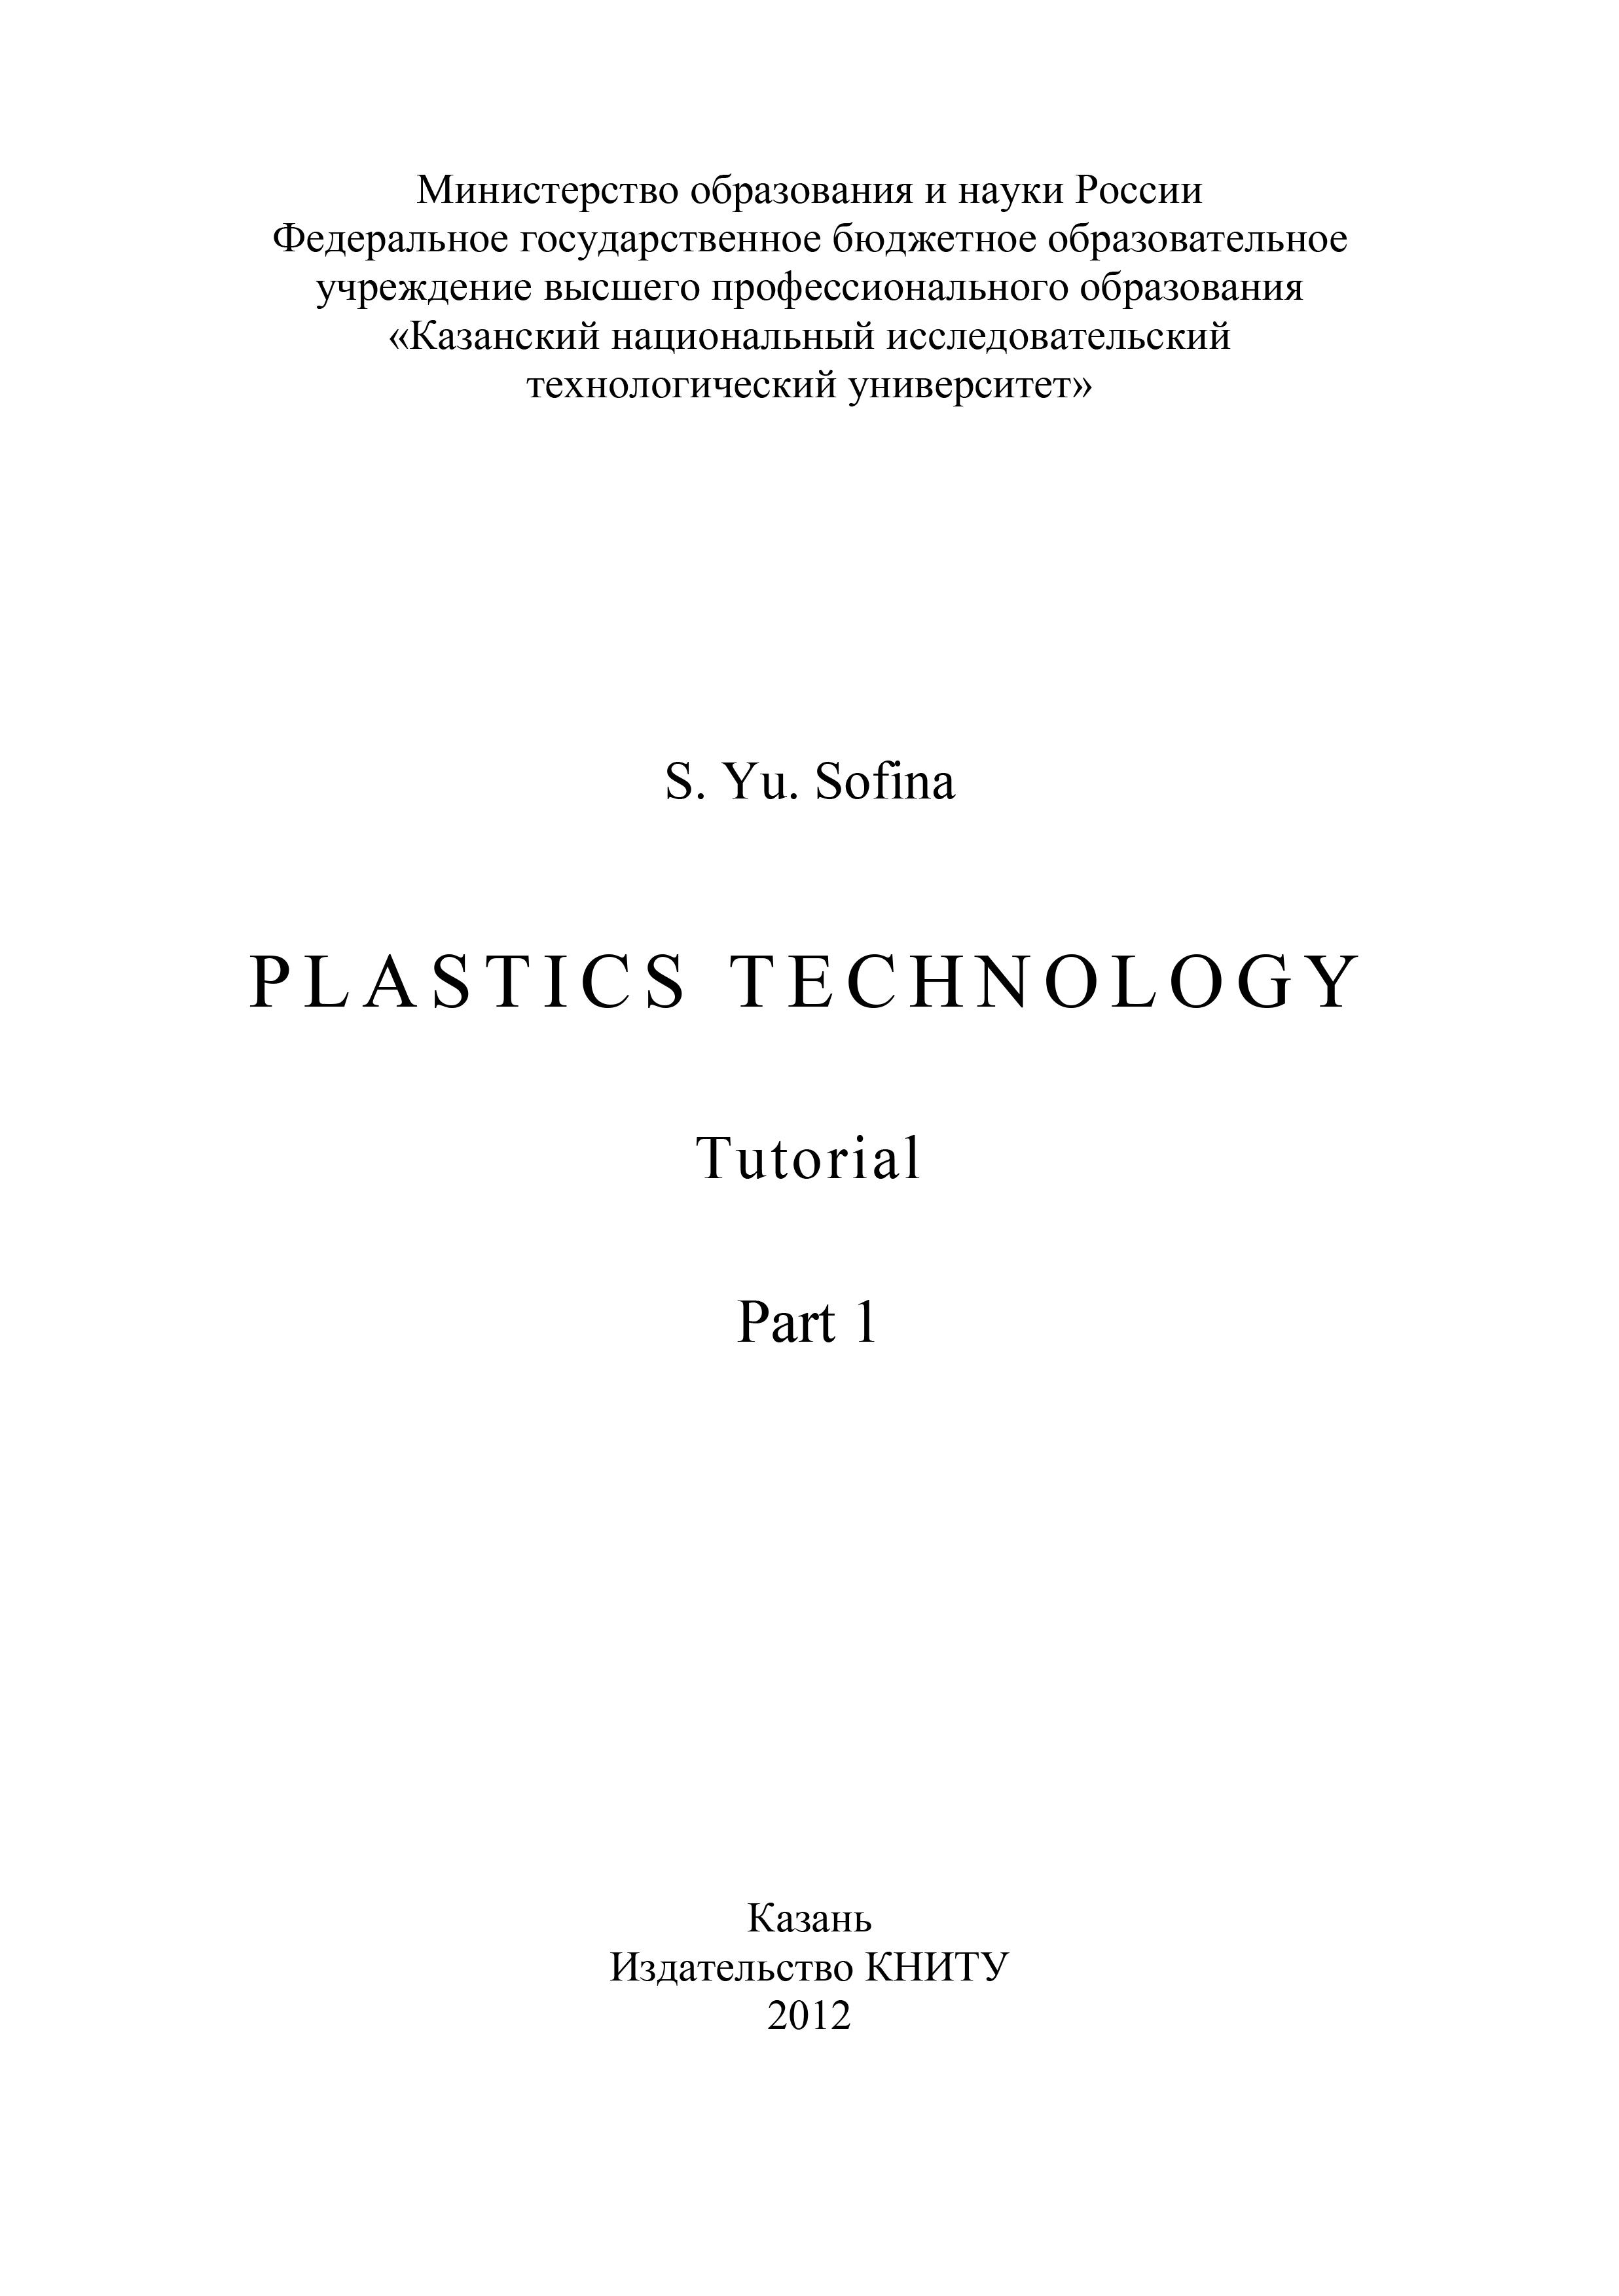 цены S. Sofina Plastics Technology. Part 1